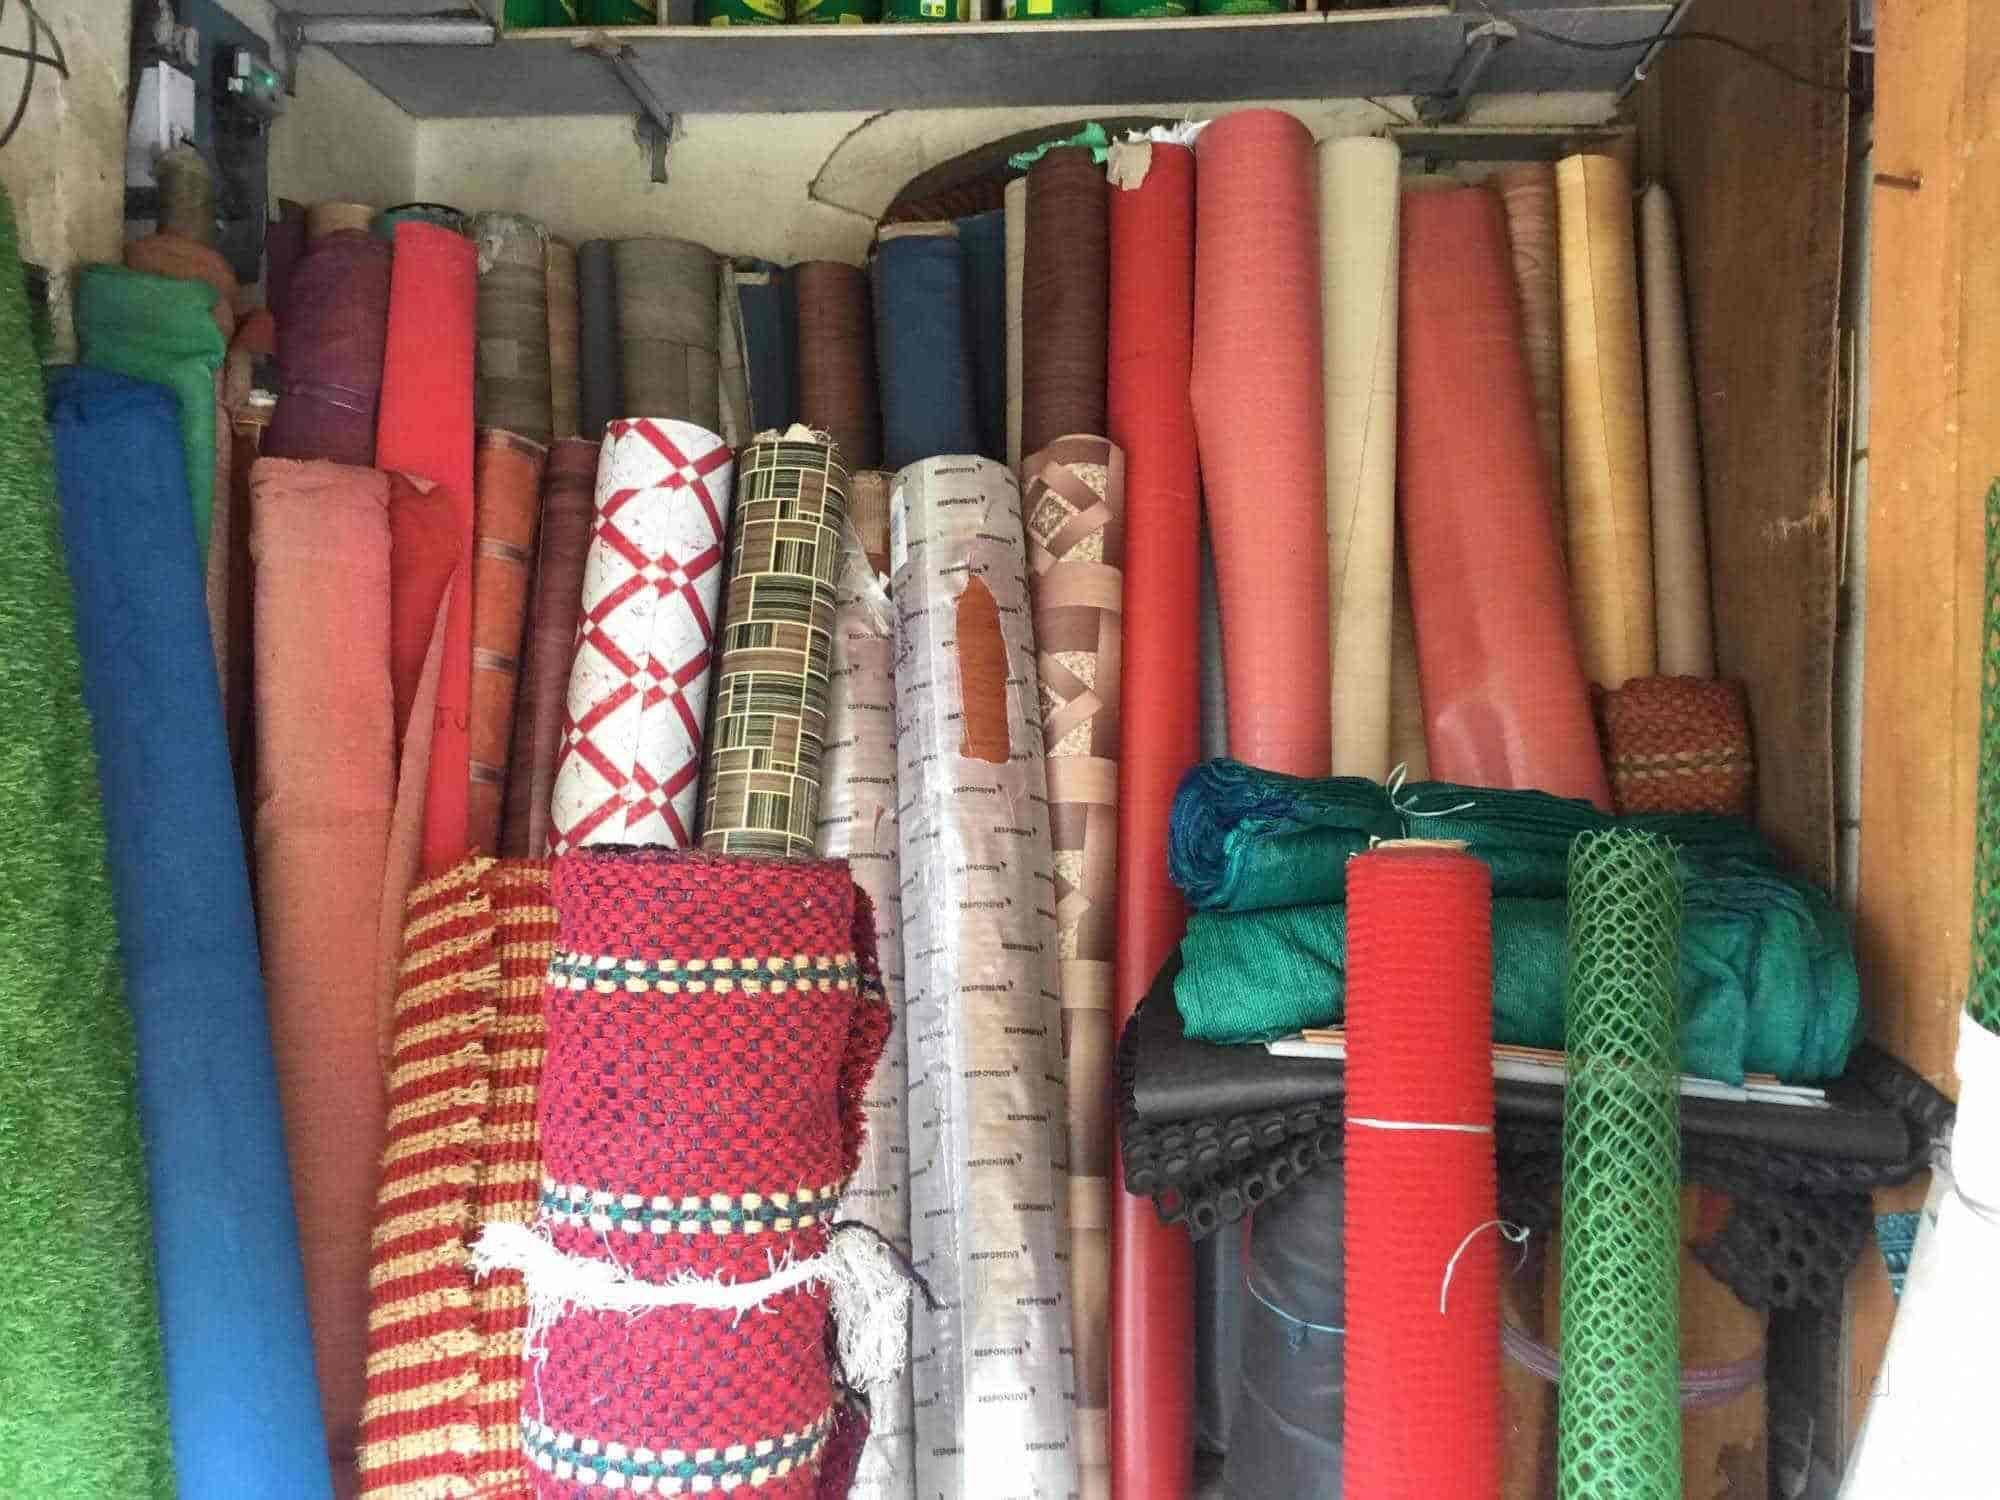 Wallpaper City Palakarai Wall Paper Dealers in Trichy Justdial